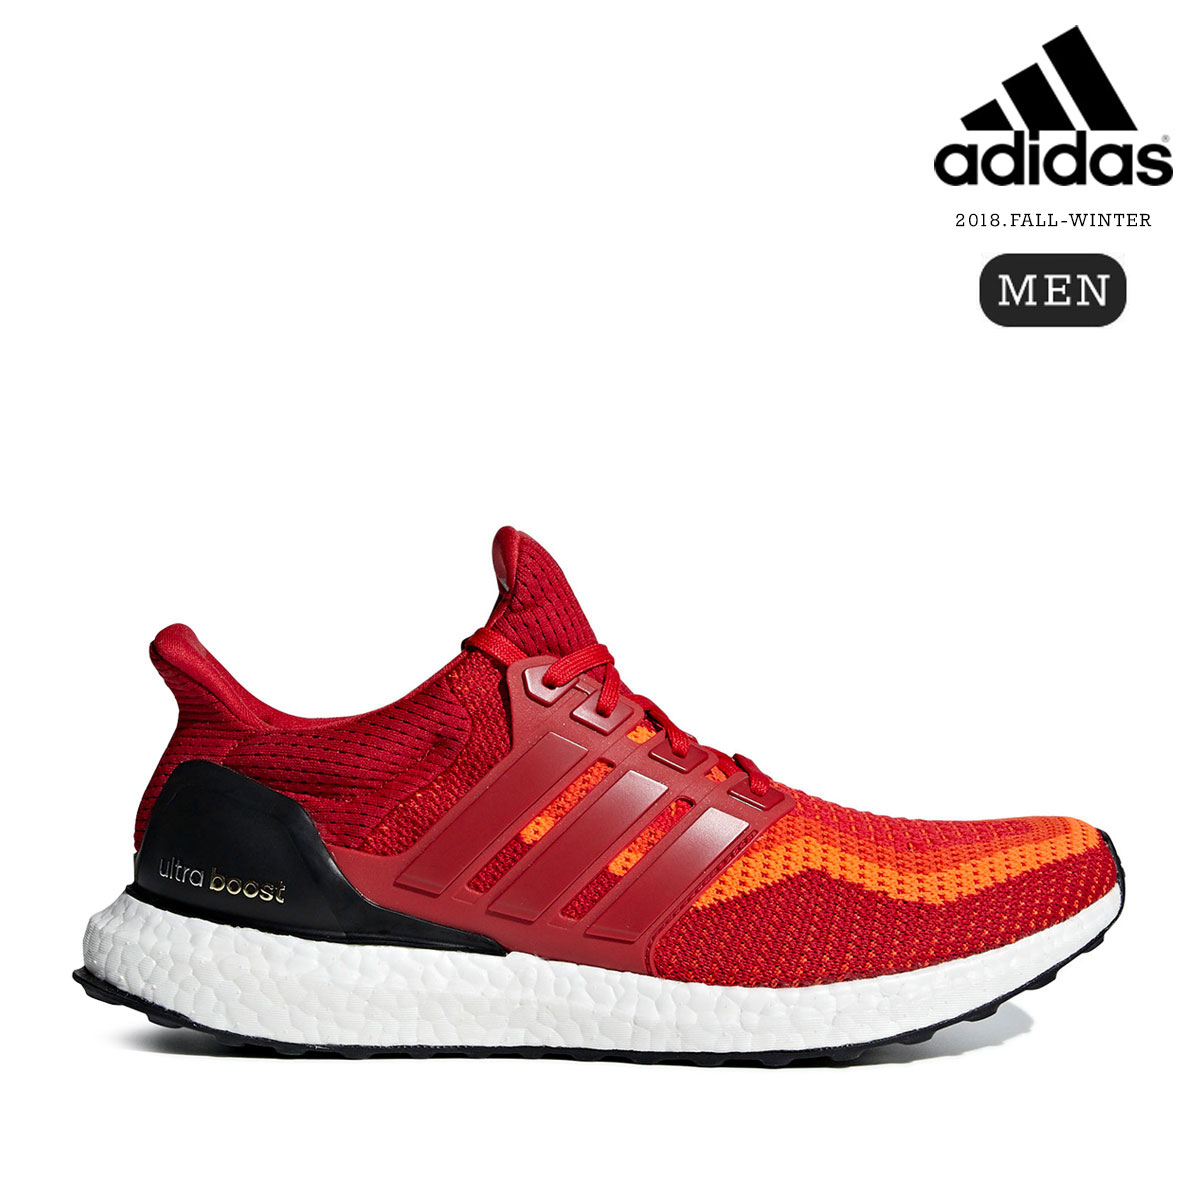 adidas UltraBOOST (Solar Red/Power Red/Core Black) 【メンズサイズ】【18FW-I】【30】【sale0123】